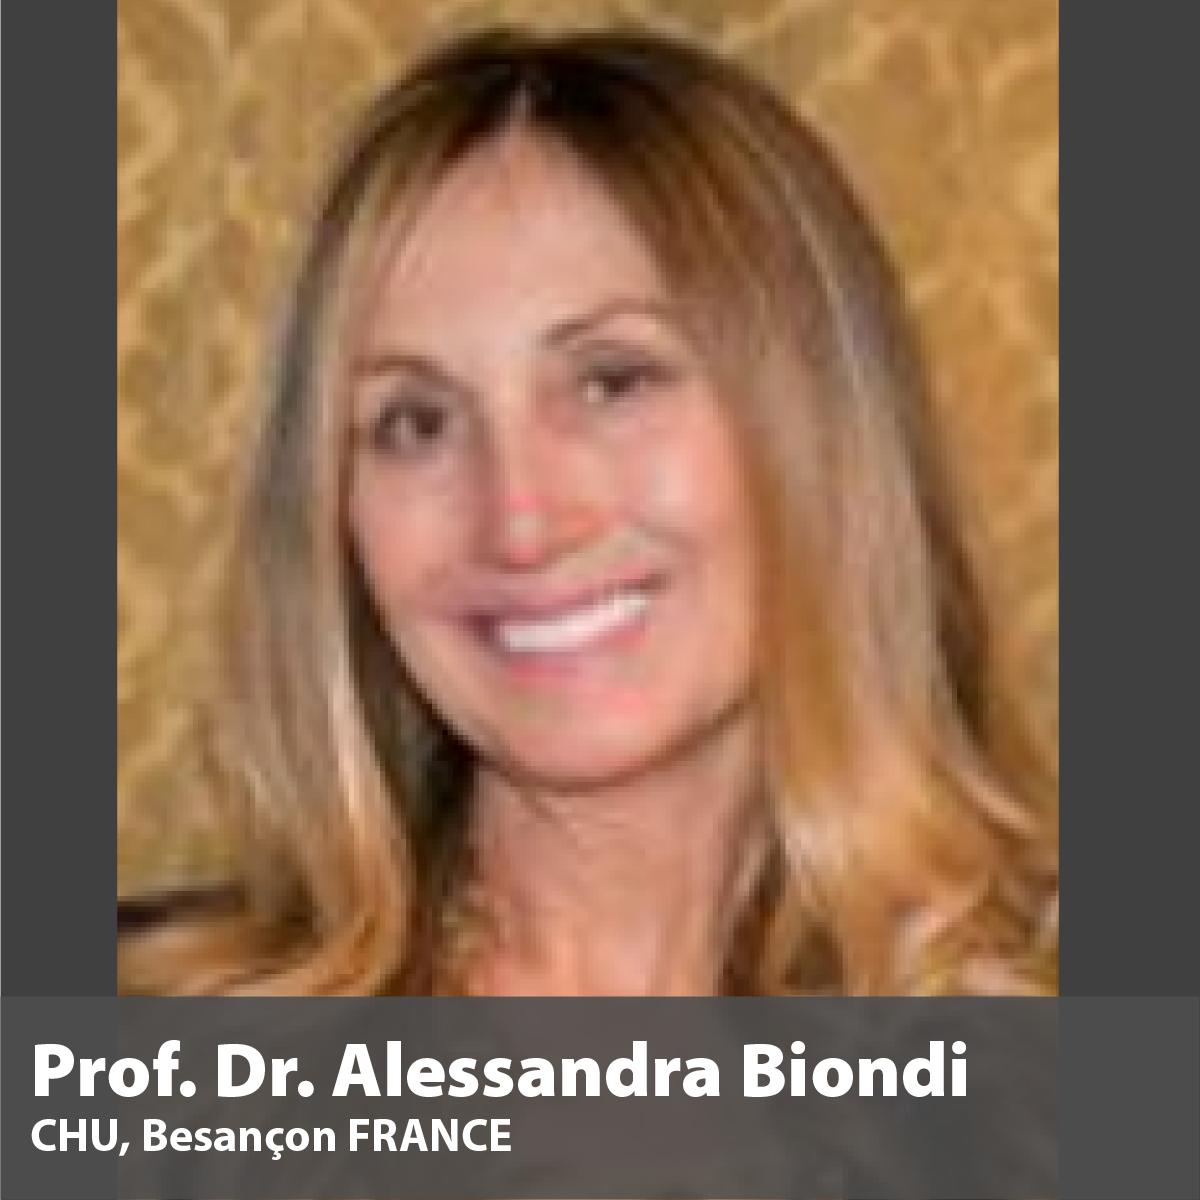 Mentor Alessandra Biondi